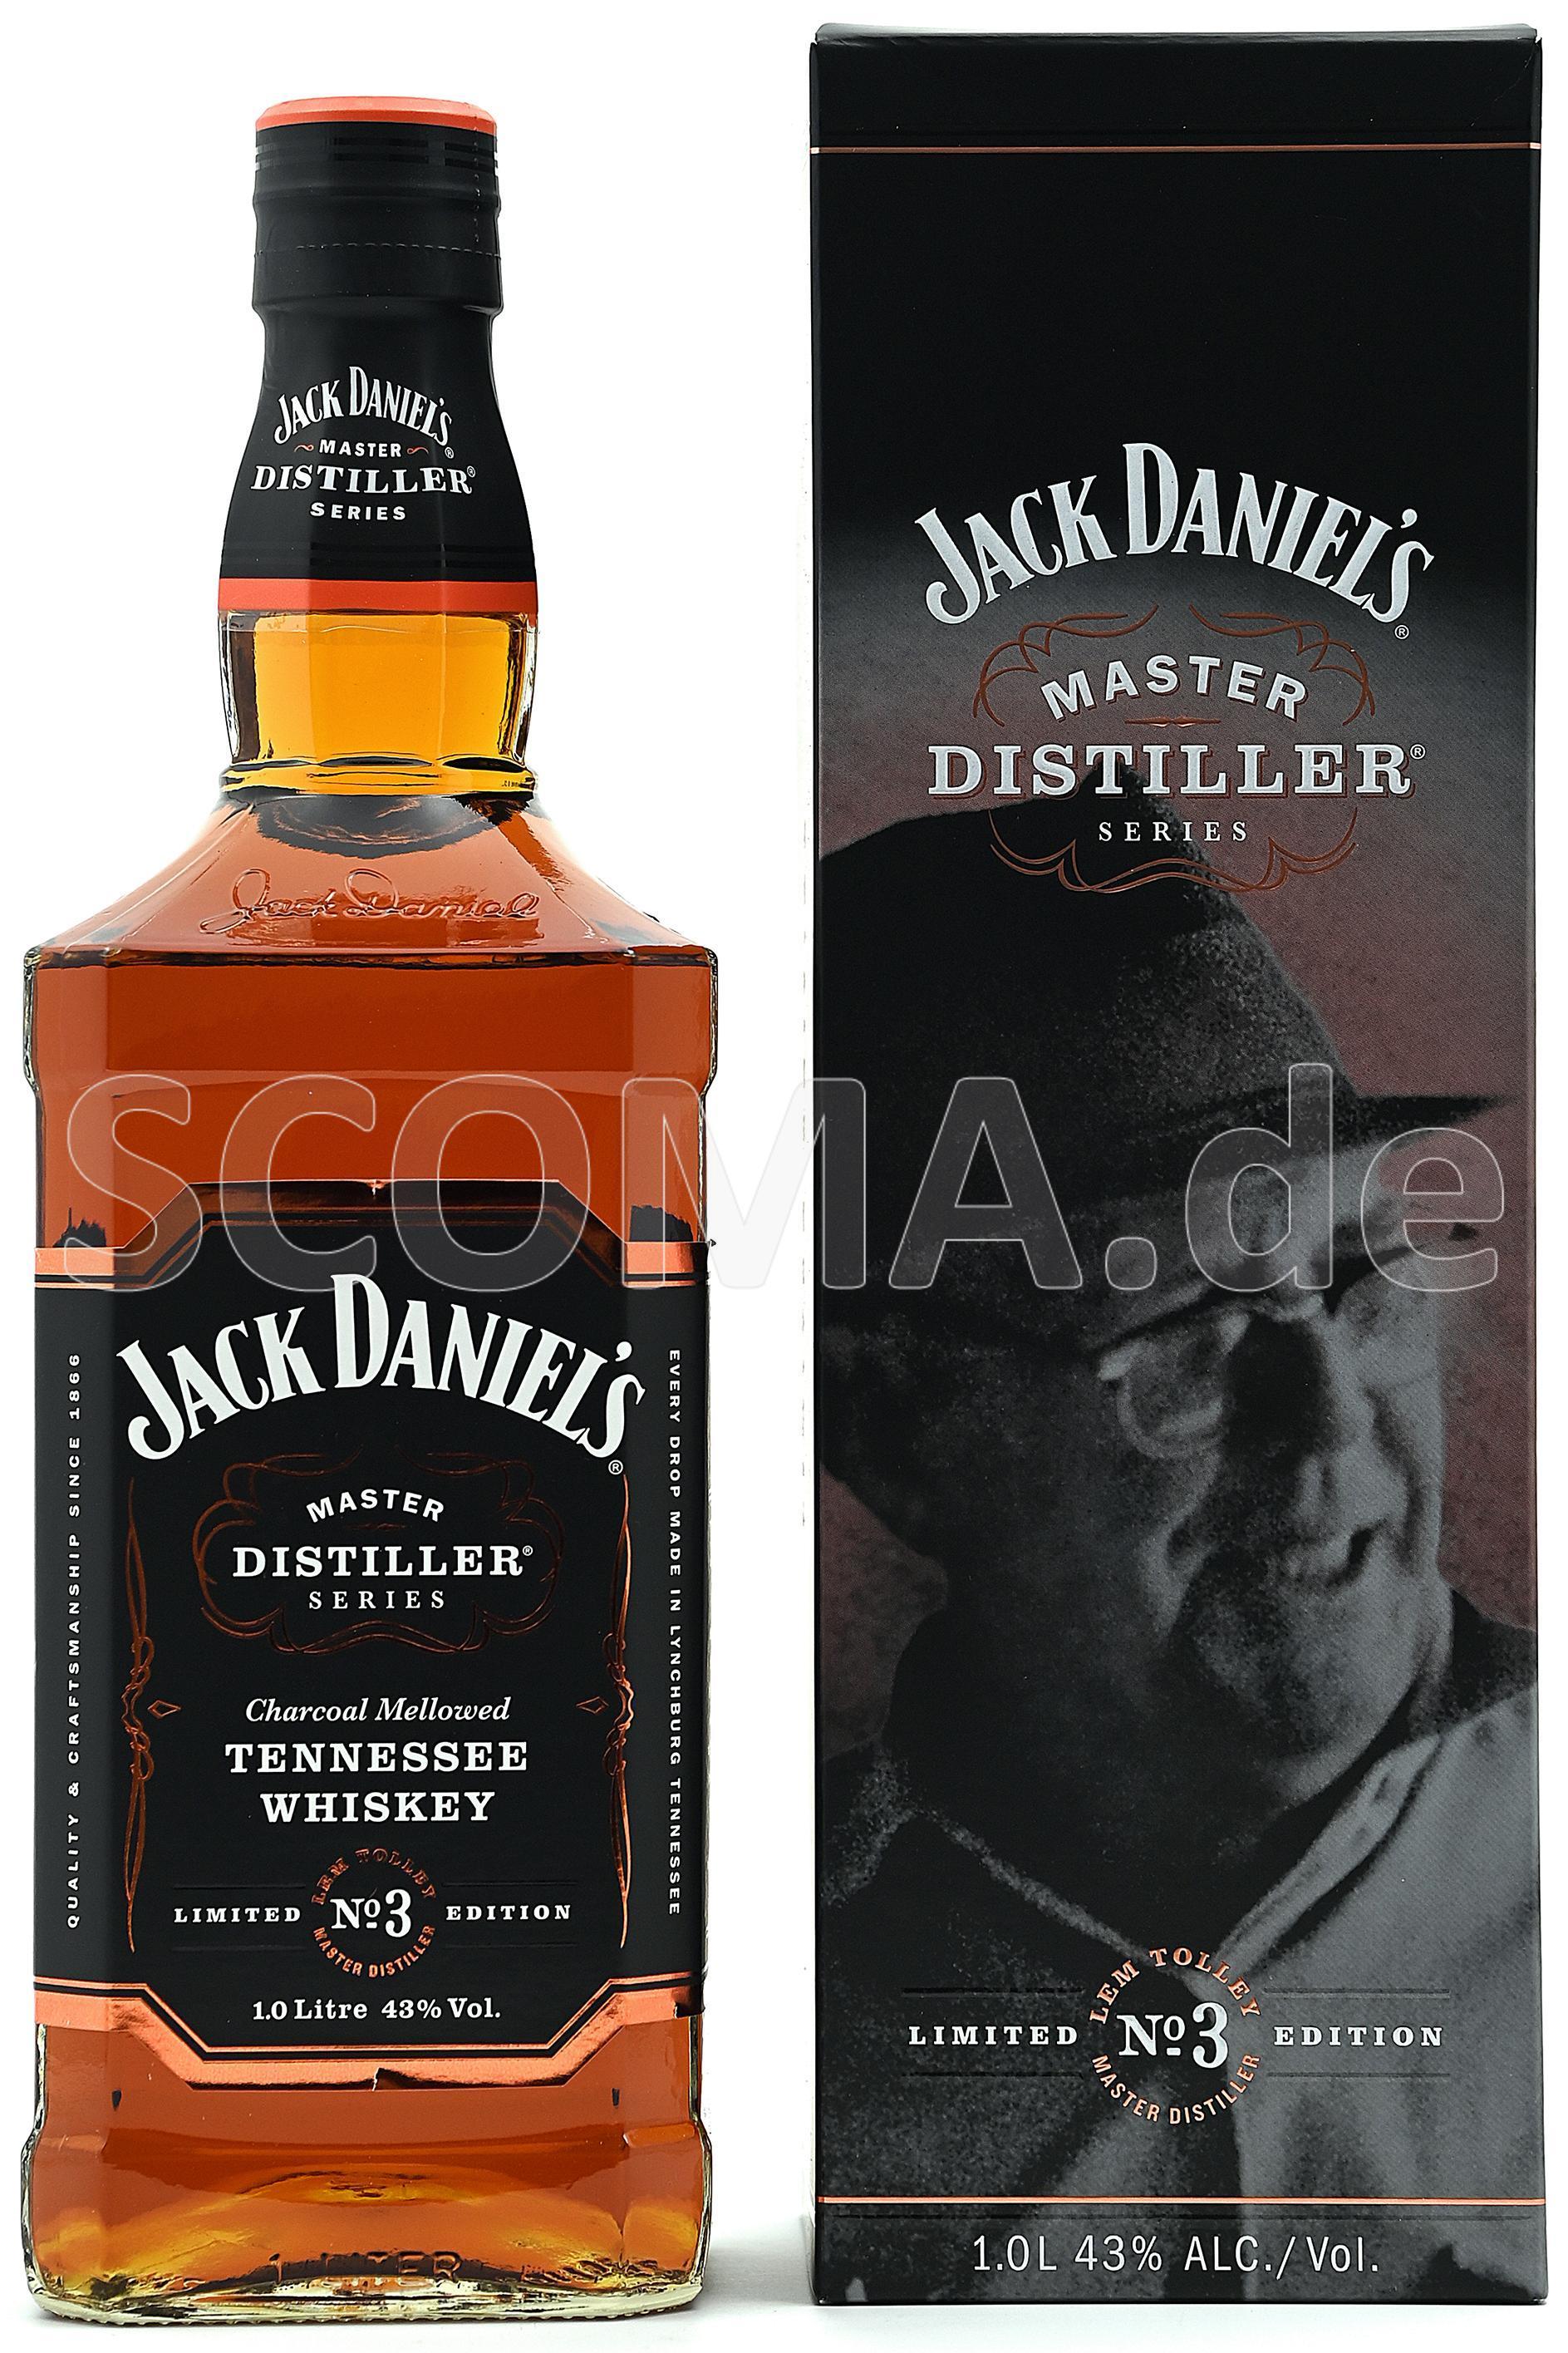 Jack Daniel's Master Distiller...